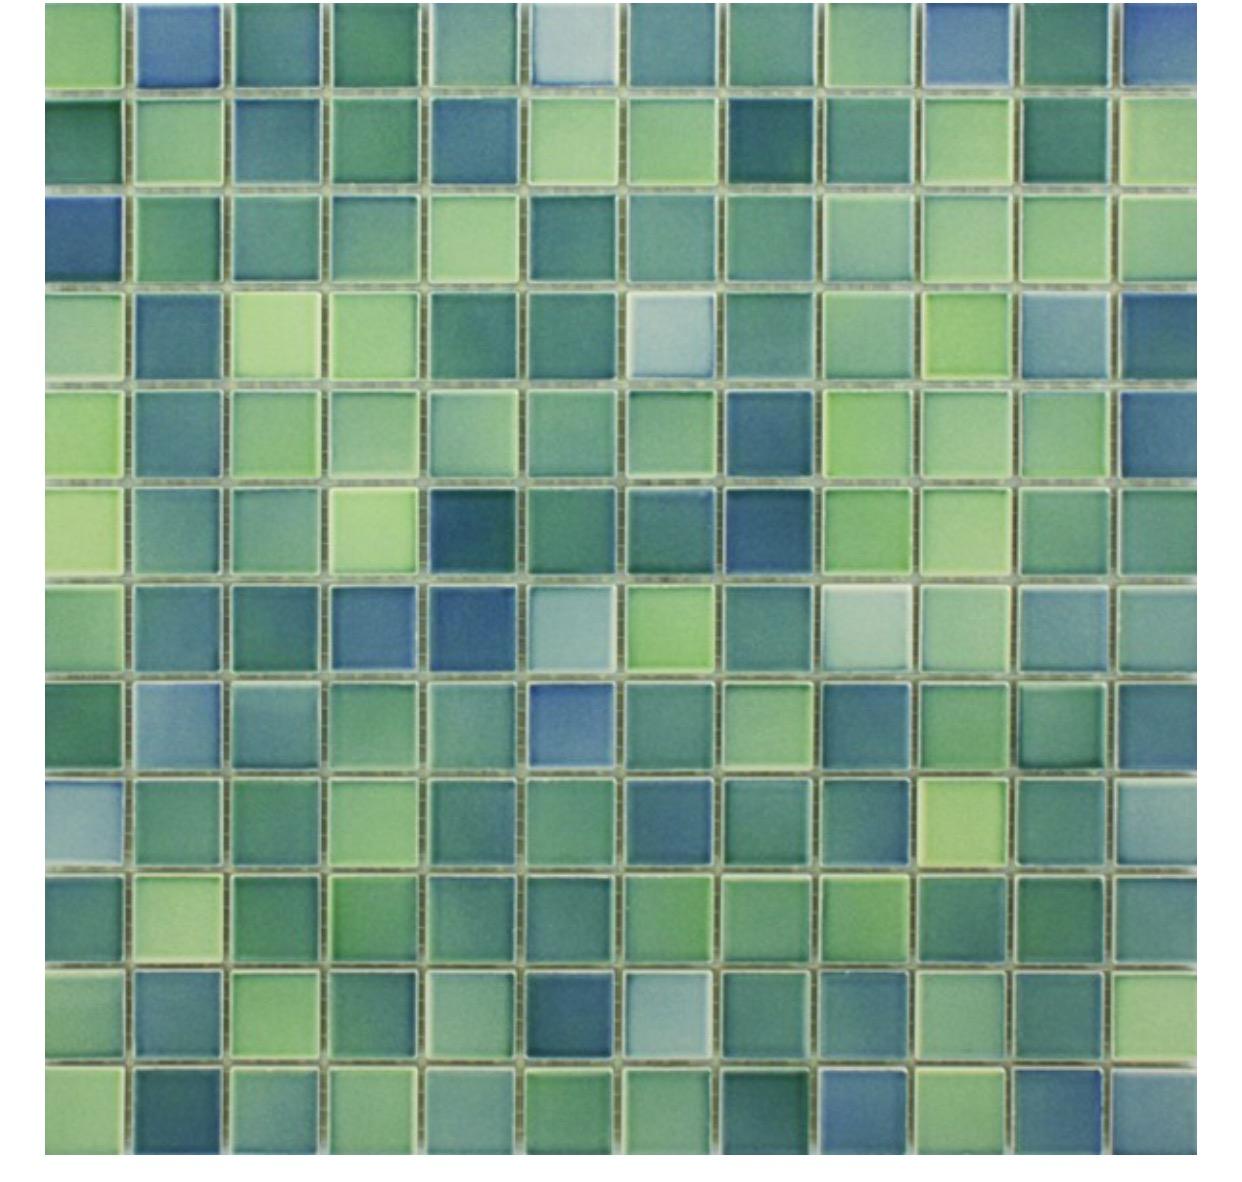 Waxman Ceramics Landscape Mosaic – Forest Mix-1 297mm x 297mm – The ...